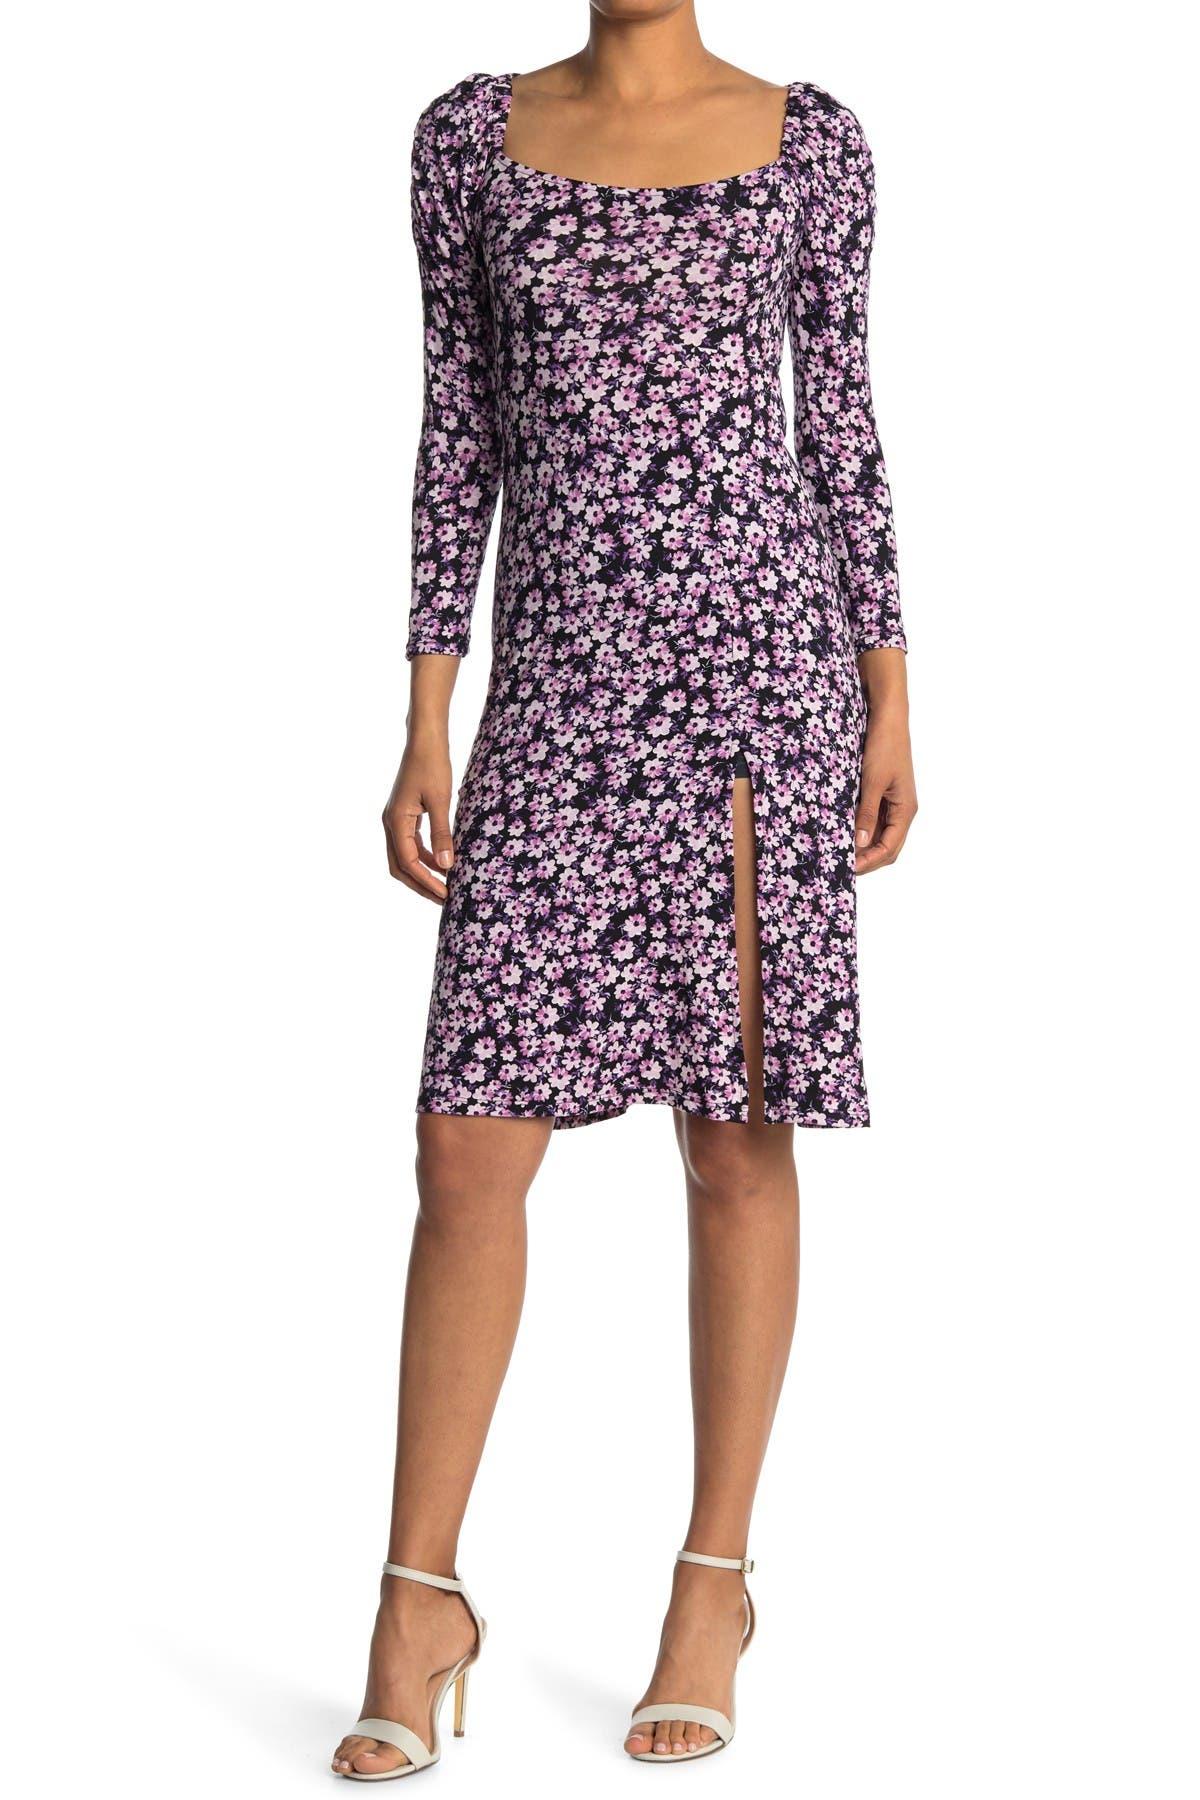 Image of Velvet Torch Puff Sleeve Bodycon Dress